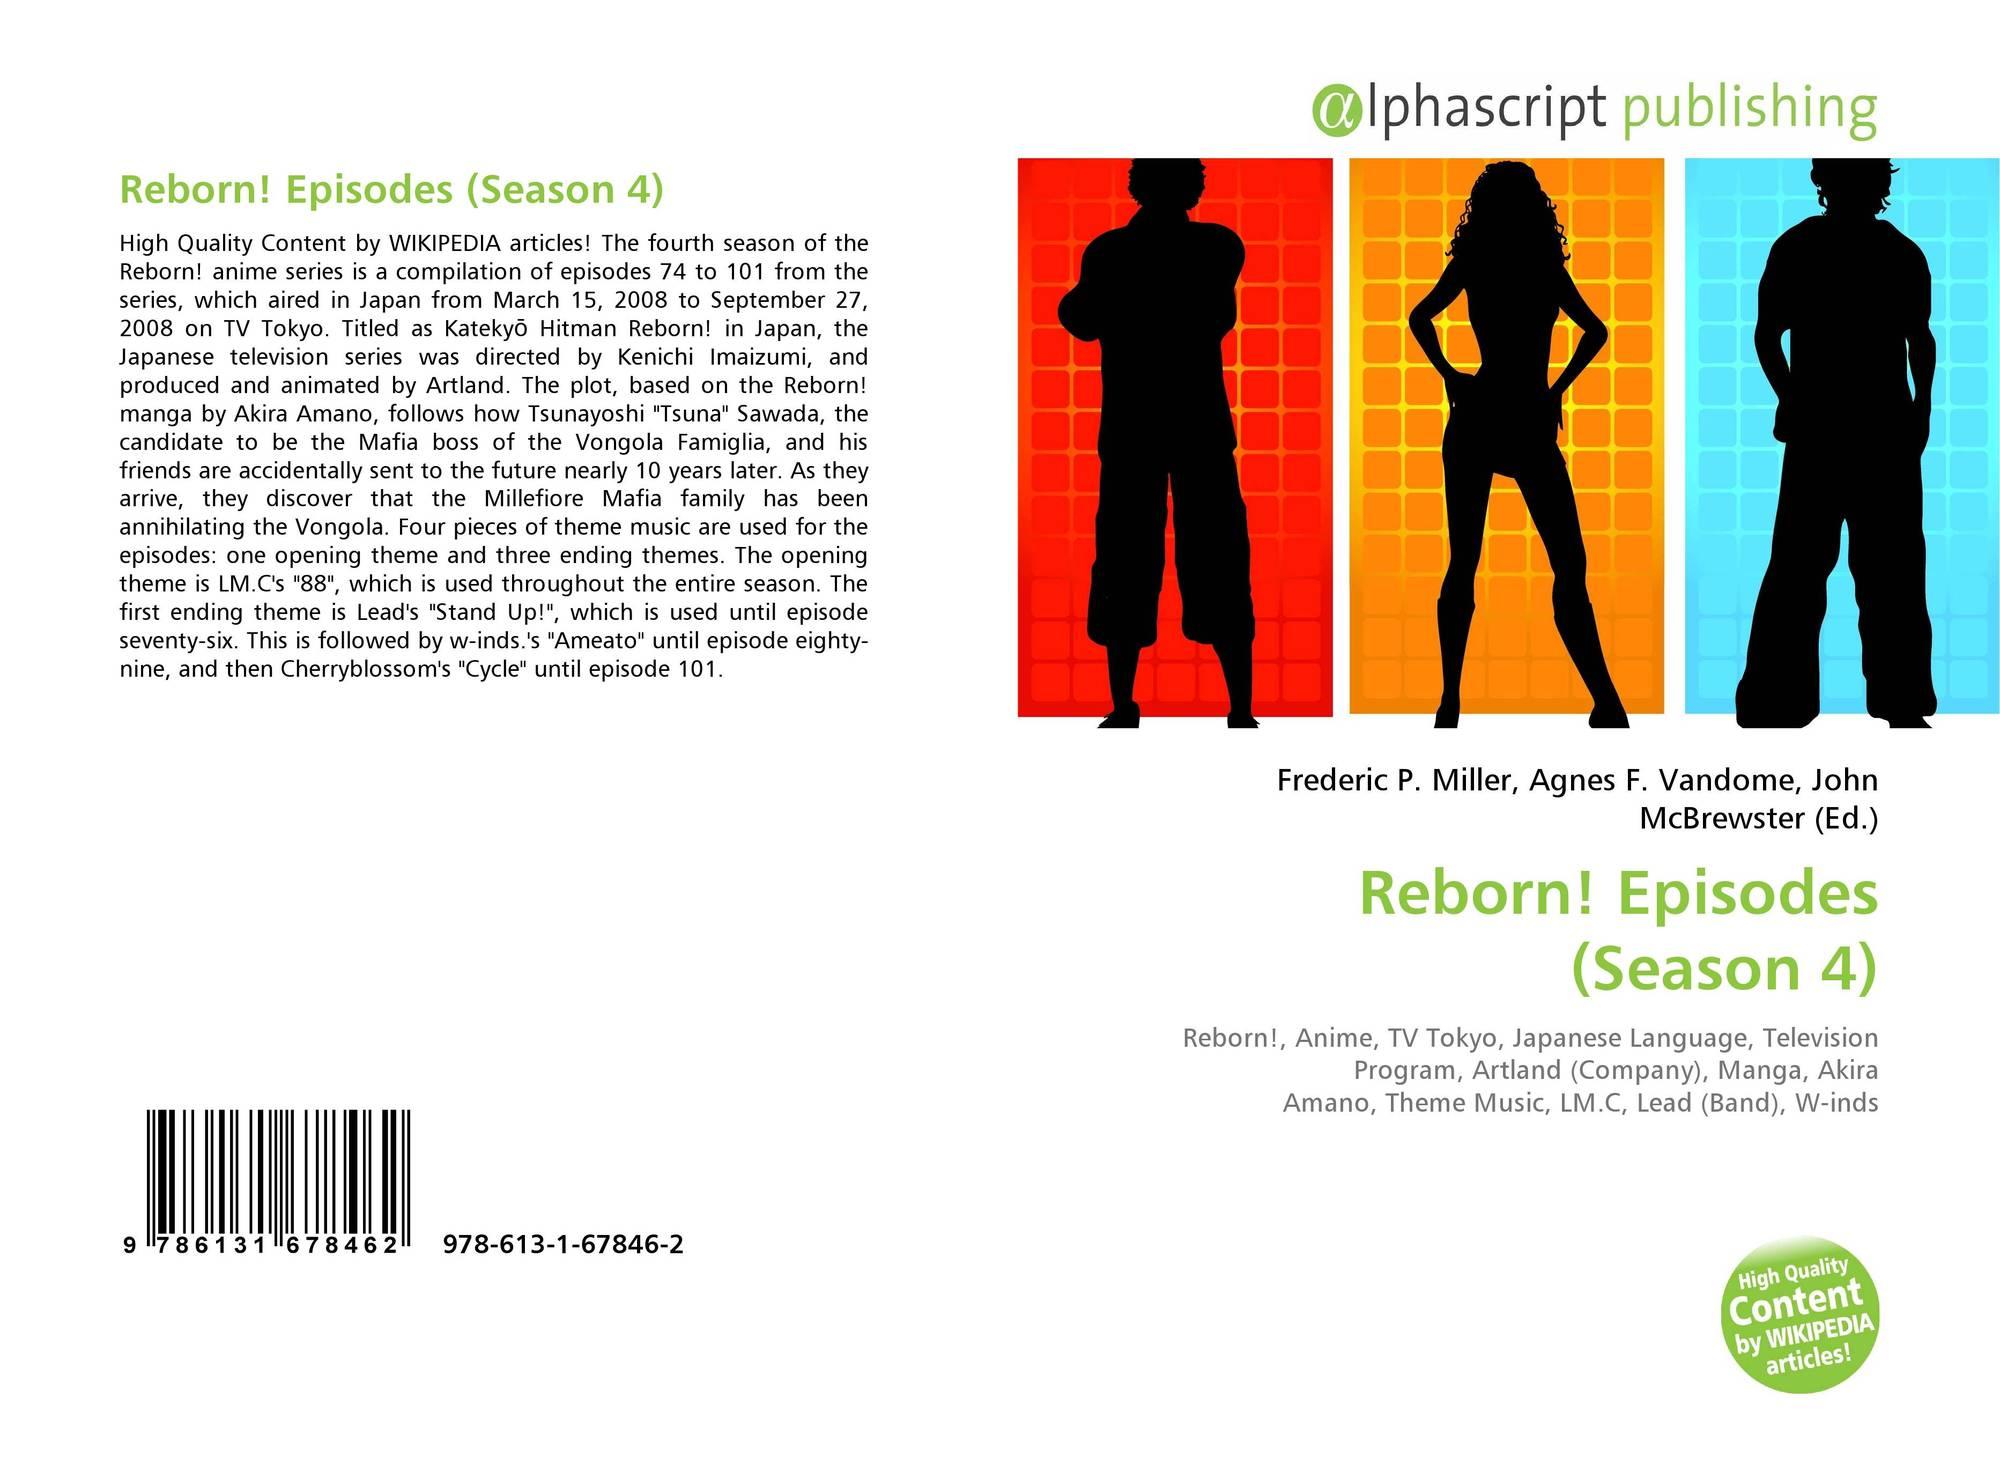 Reborn! Episodes (Season 4), 978-613-1-67846-2, 6131678464